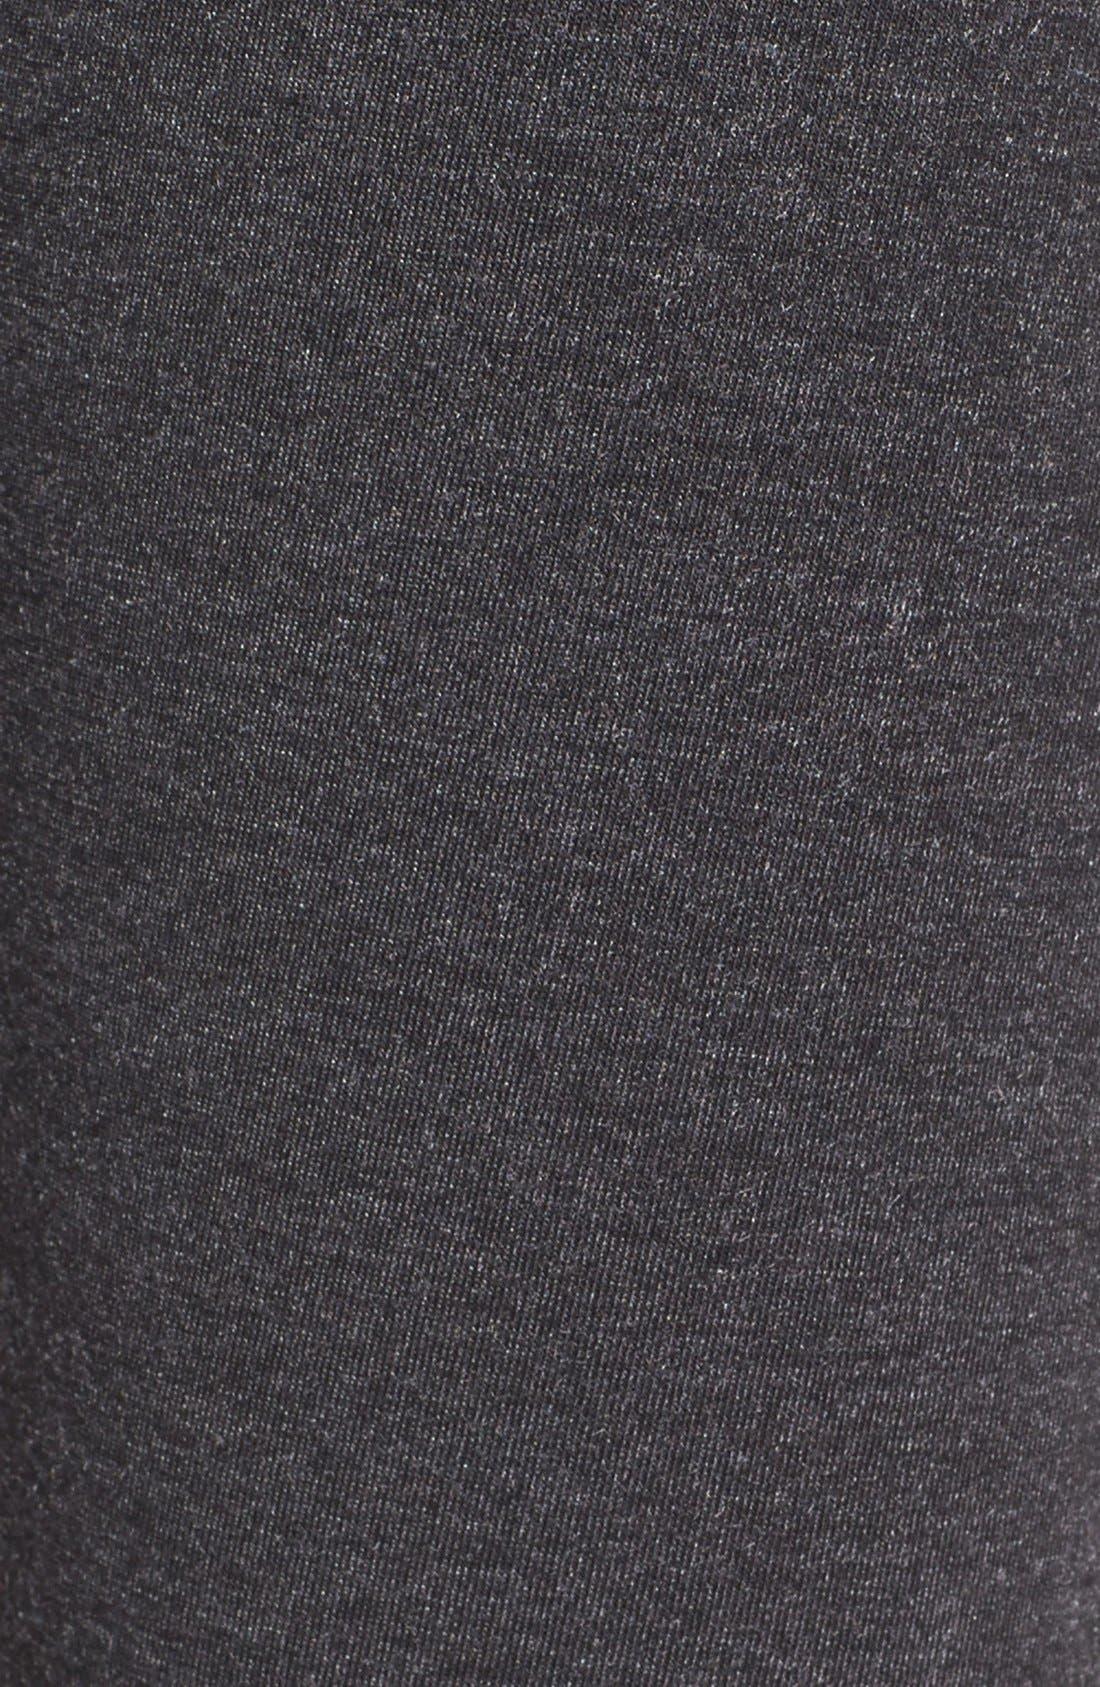 'Layer Me Up' Skirted Leggings,                             Alternate thumbnail 6, color,                             Grey Dark Charcoal Heather